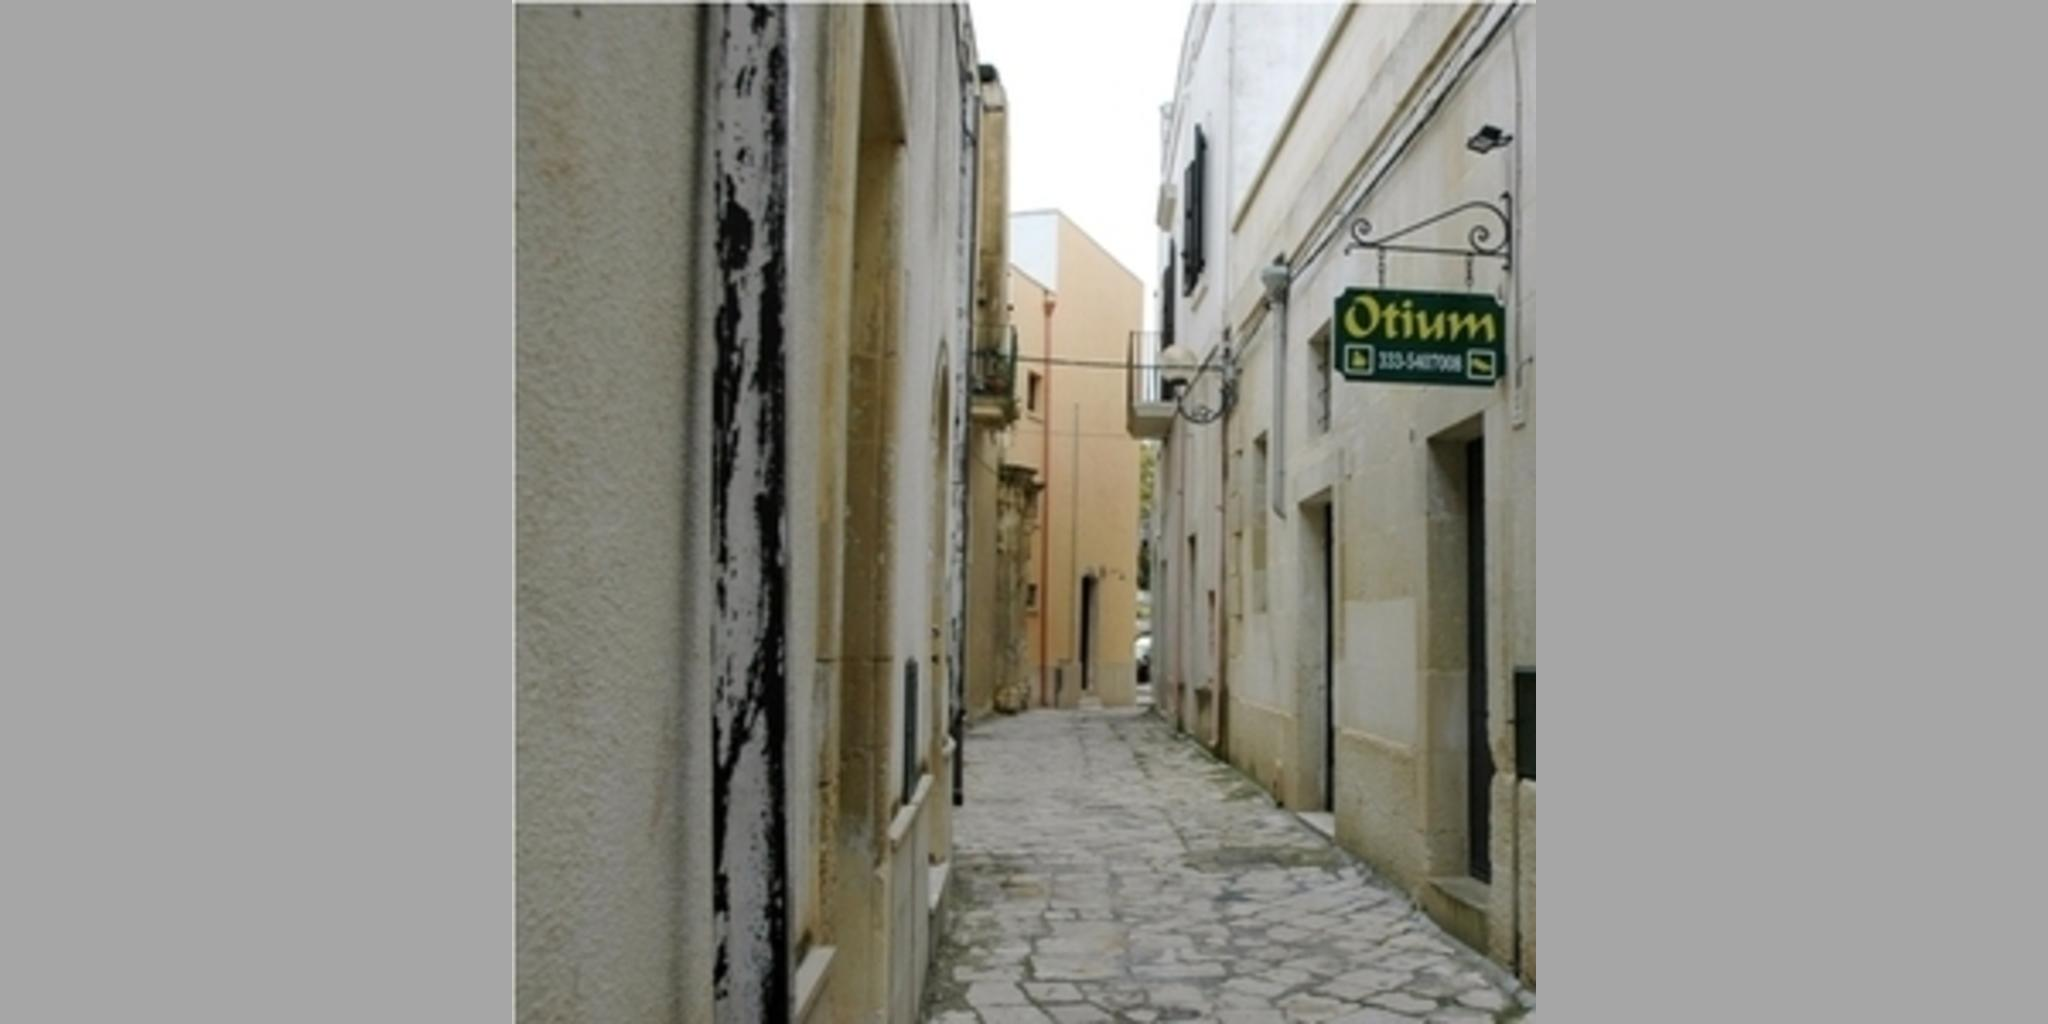 Guest House Cutrofiano - Salento_A